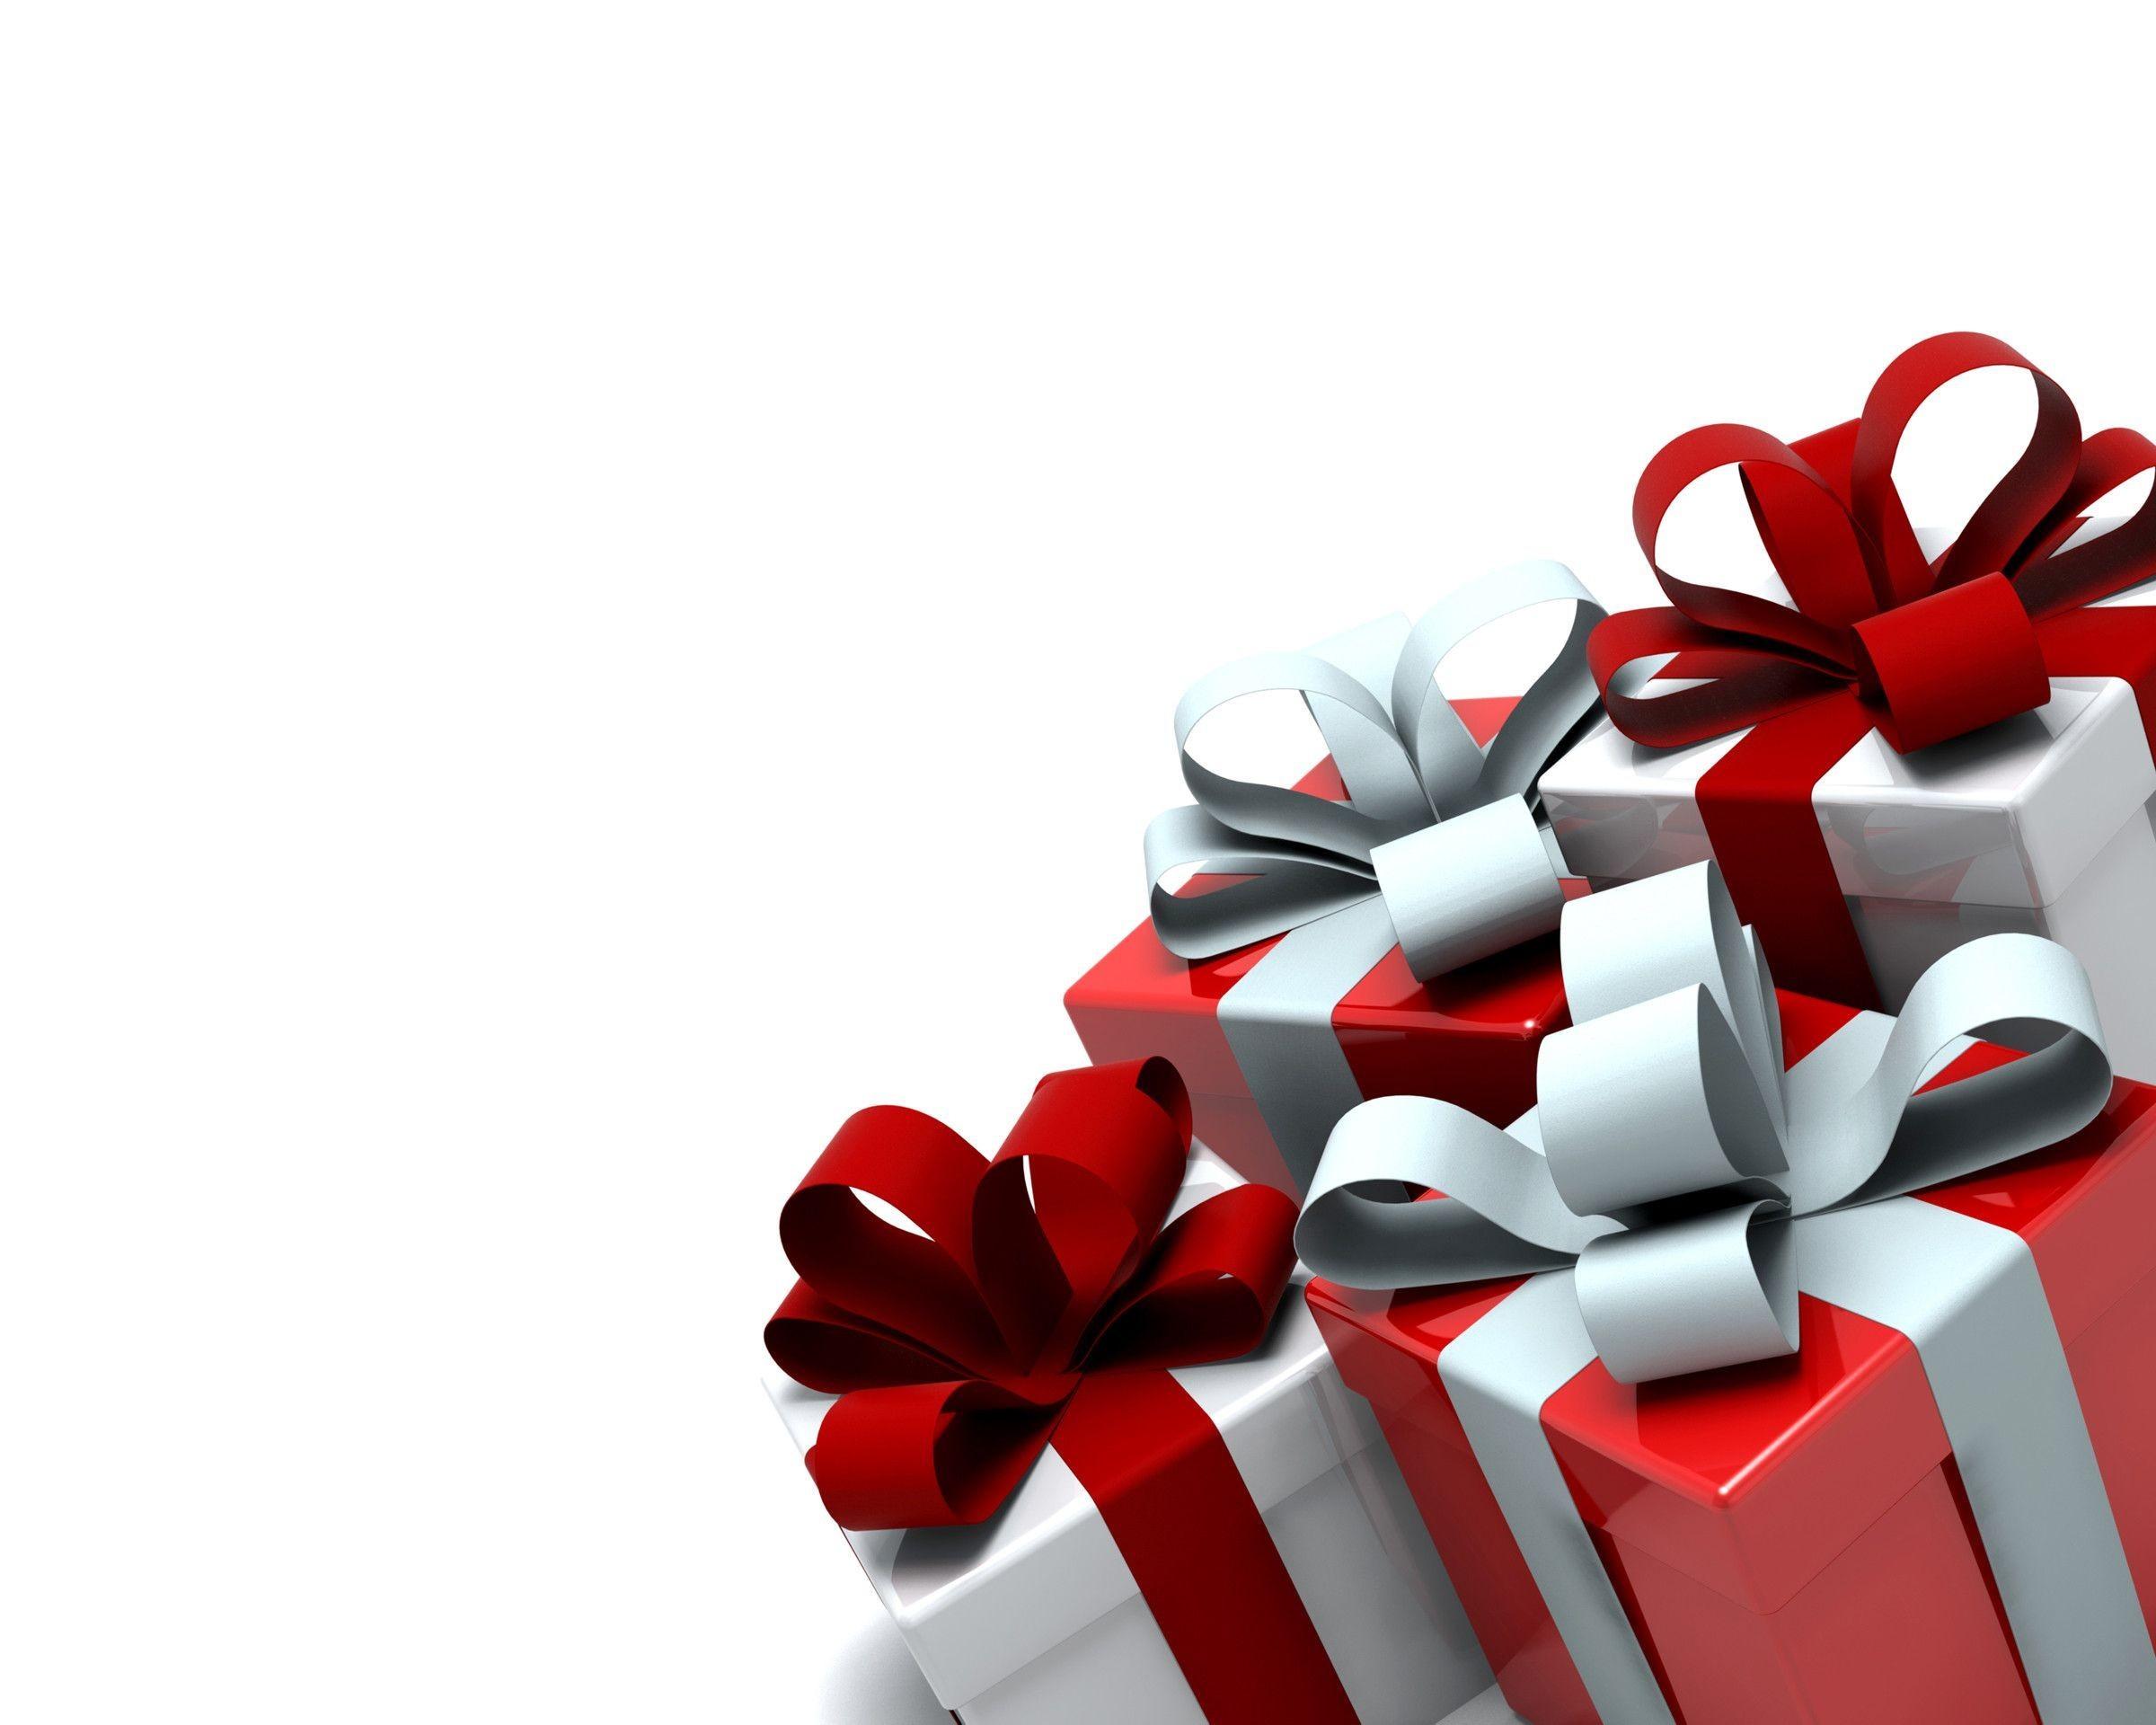 … Wallpaper Sea Christmas Gift Backgrounds